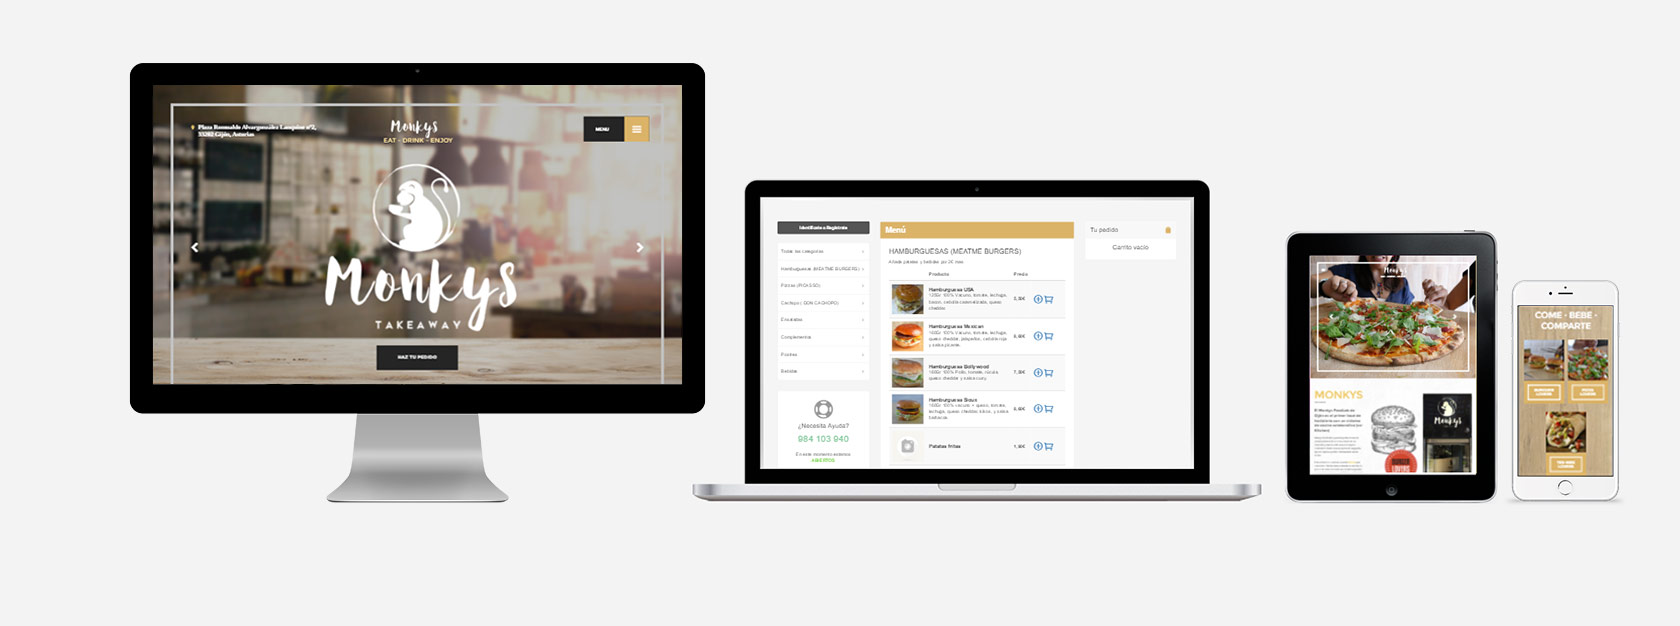 e-Commerce websites - web design by Eduardo Morales